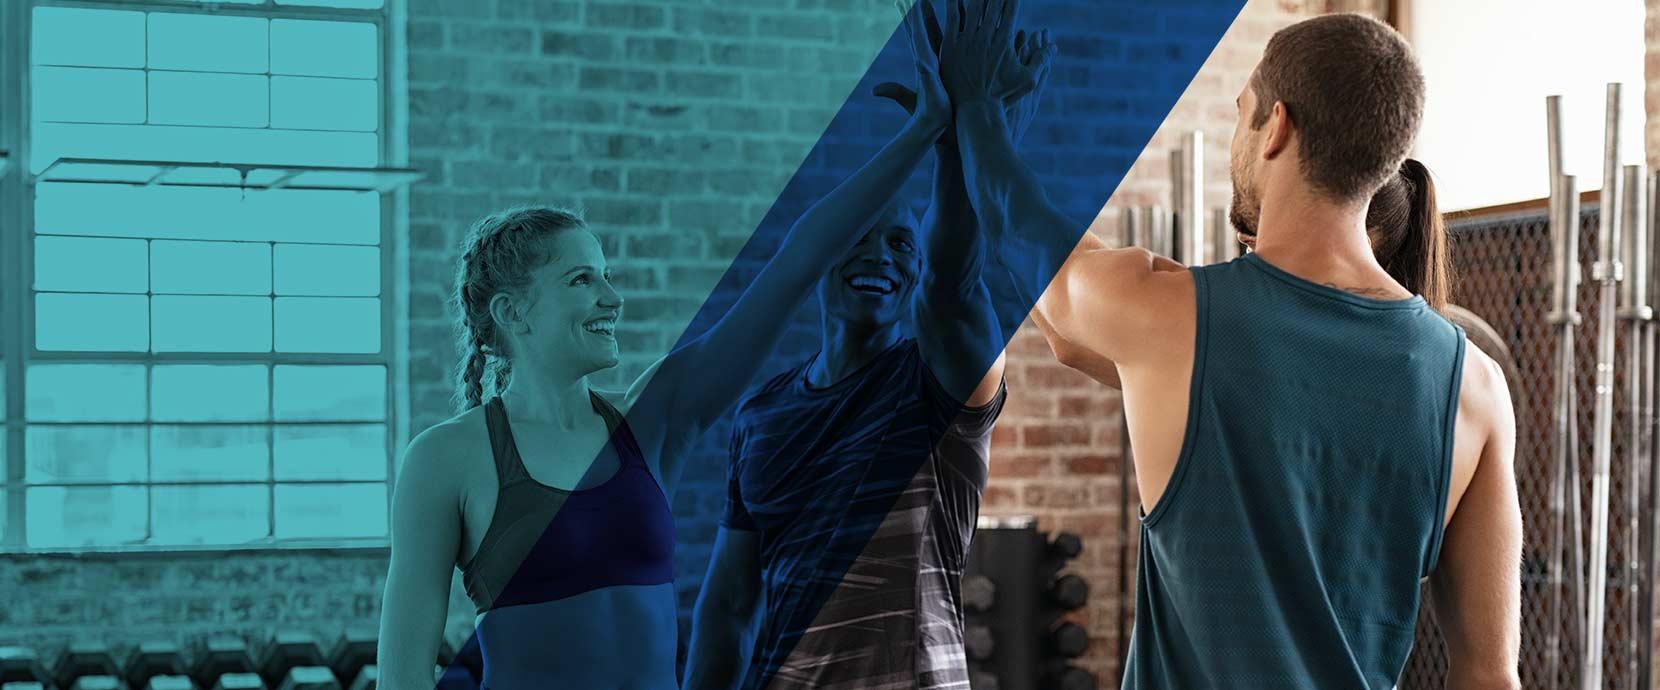 Cont online dedicat membrilor sălii de fitness